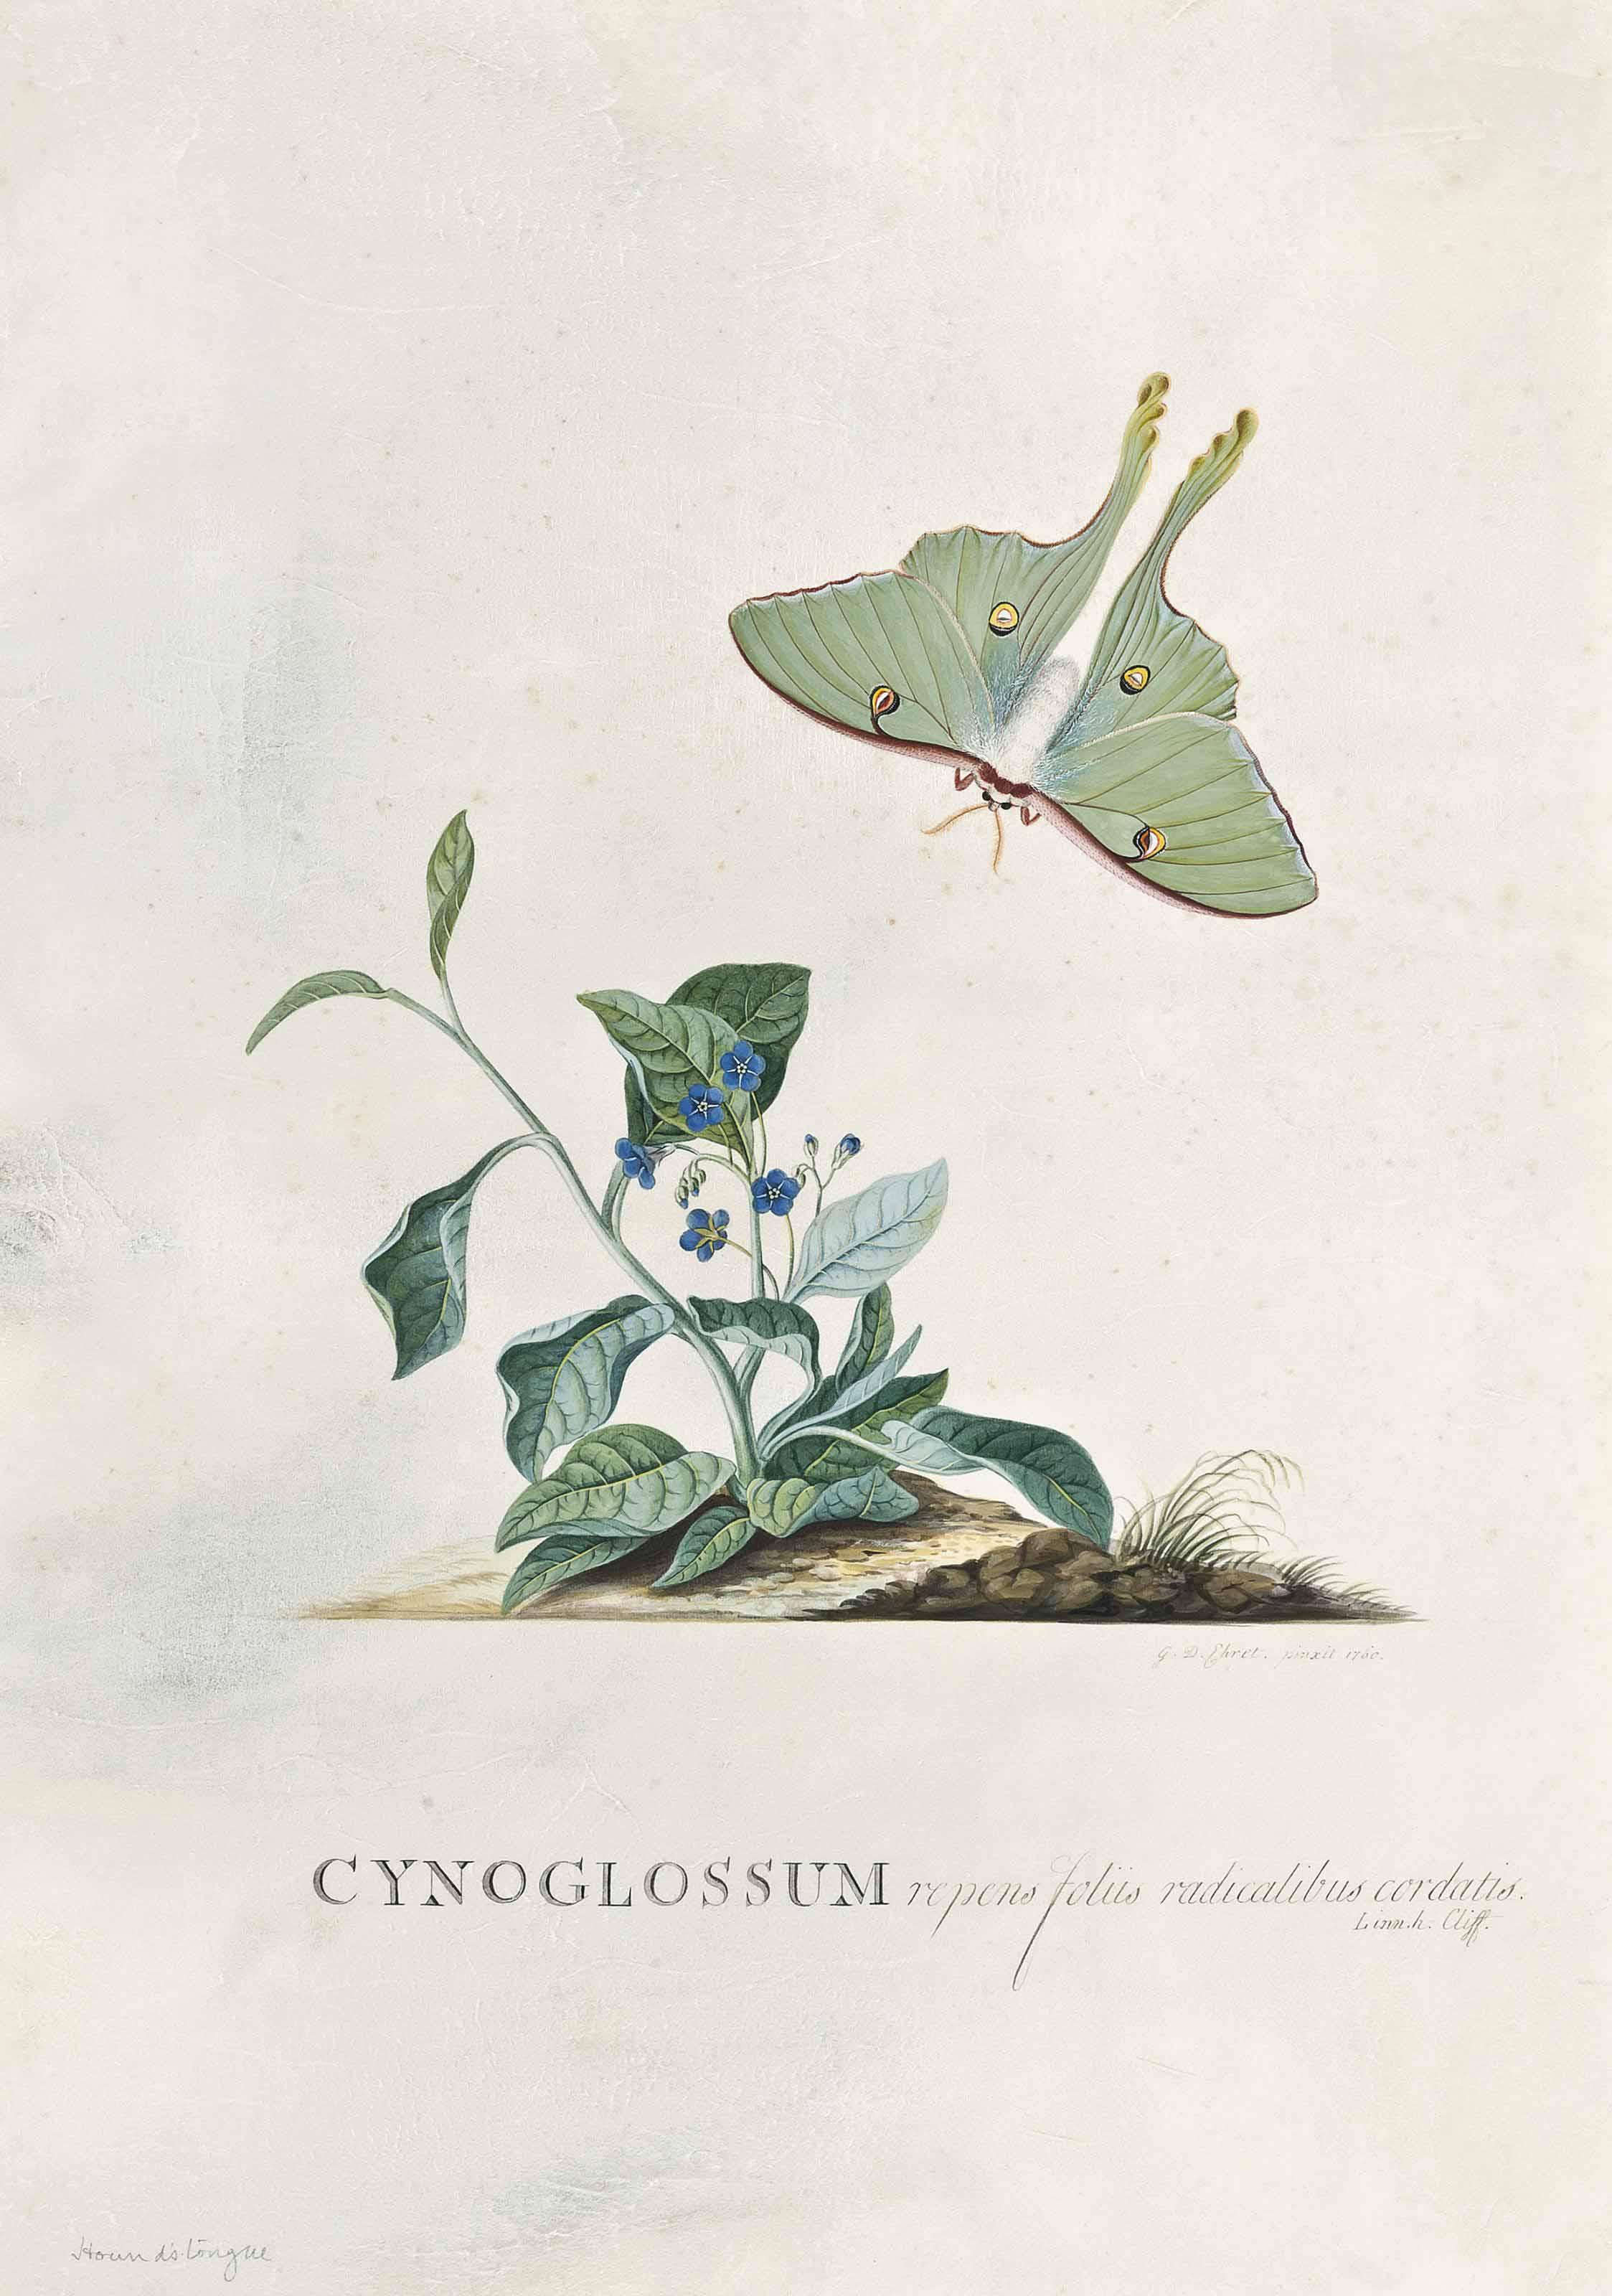 Cynoglossum repens foliis radicalibus cordatis